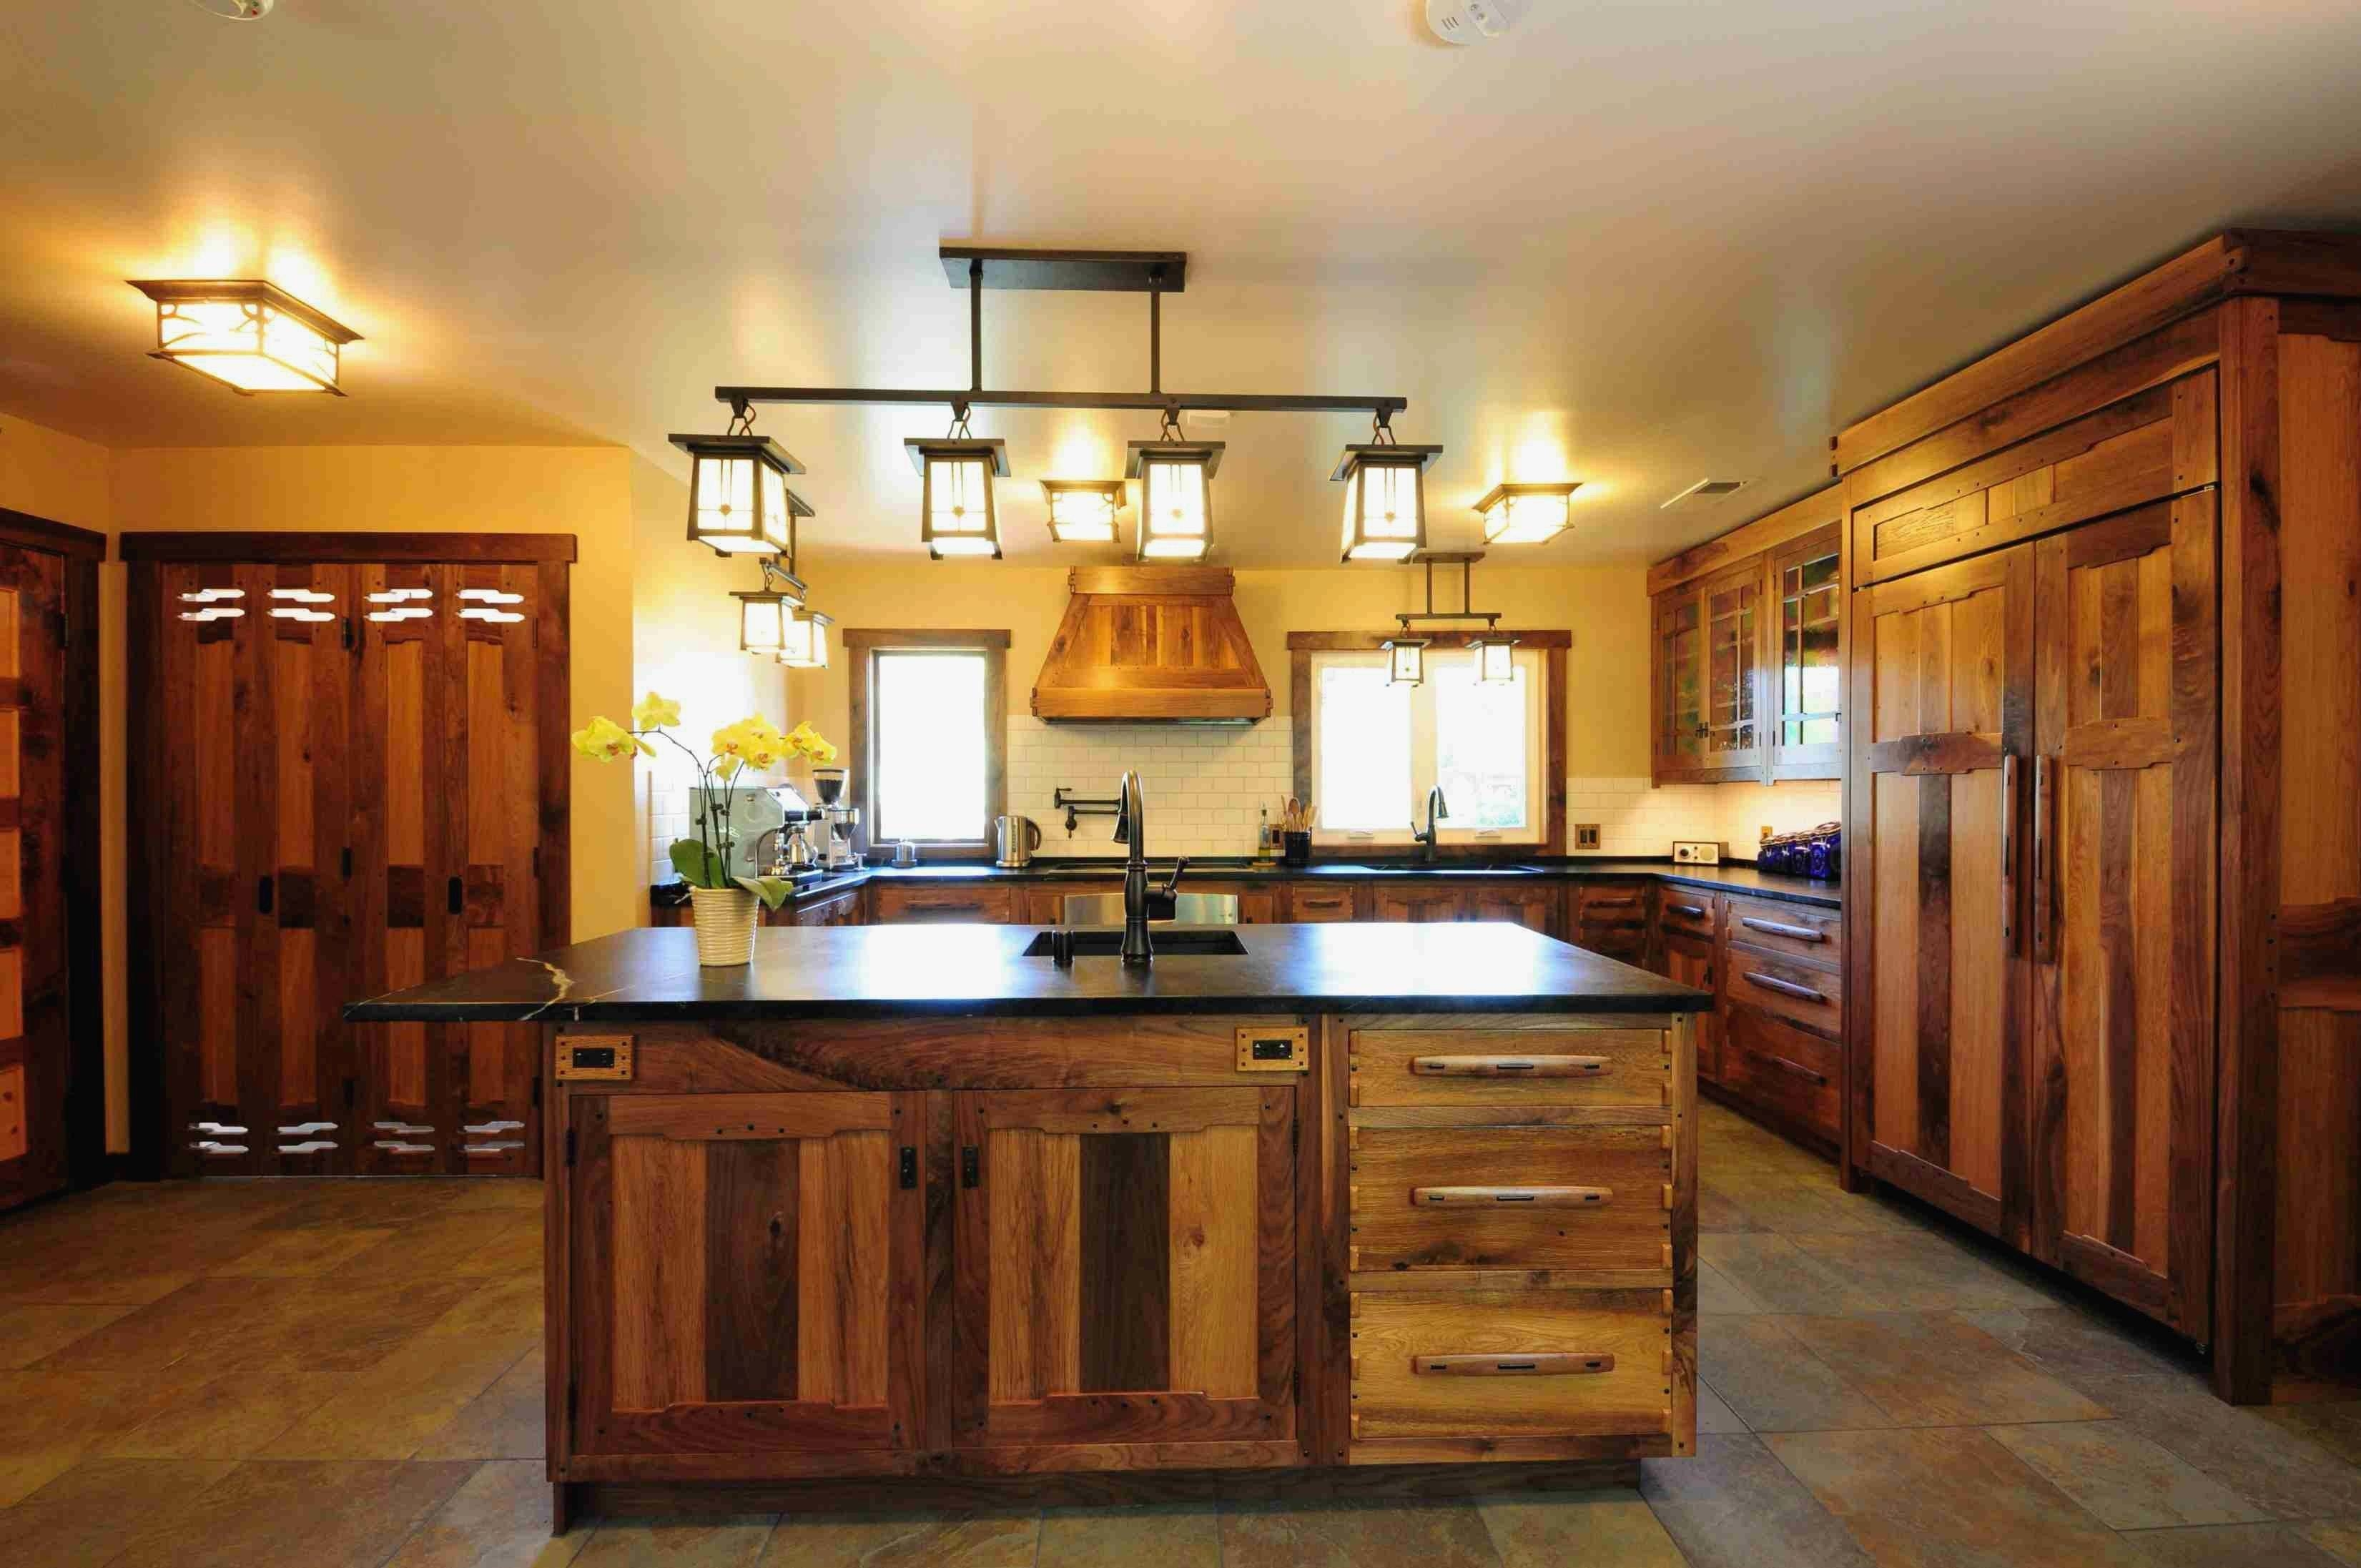 Tasty Wrought Iron Kitchen Light Fixtures 14 Wrought Iron Kitchen For Wrought Iron Kitchen Lights Fixtures (View 11 of 15)